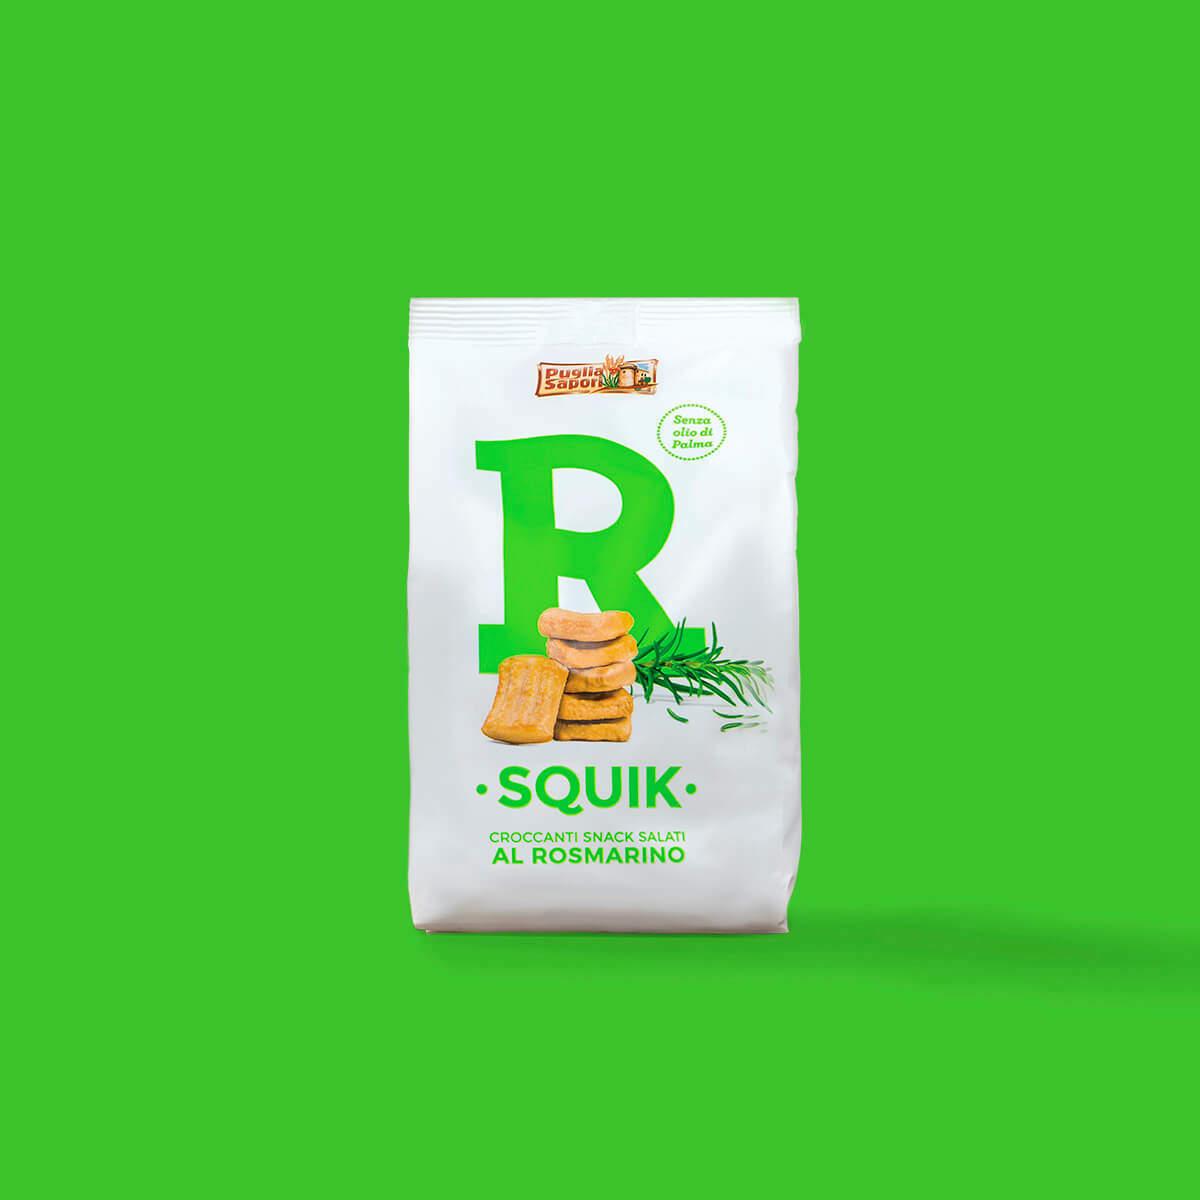 food packaging rosmarino puglia sapori